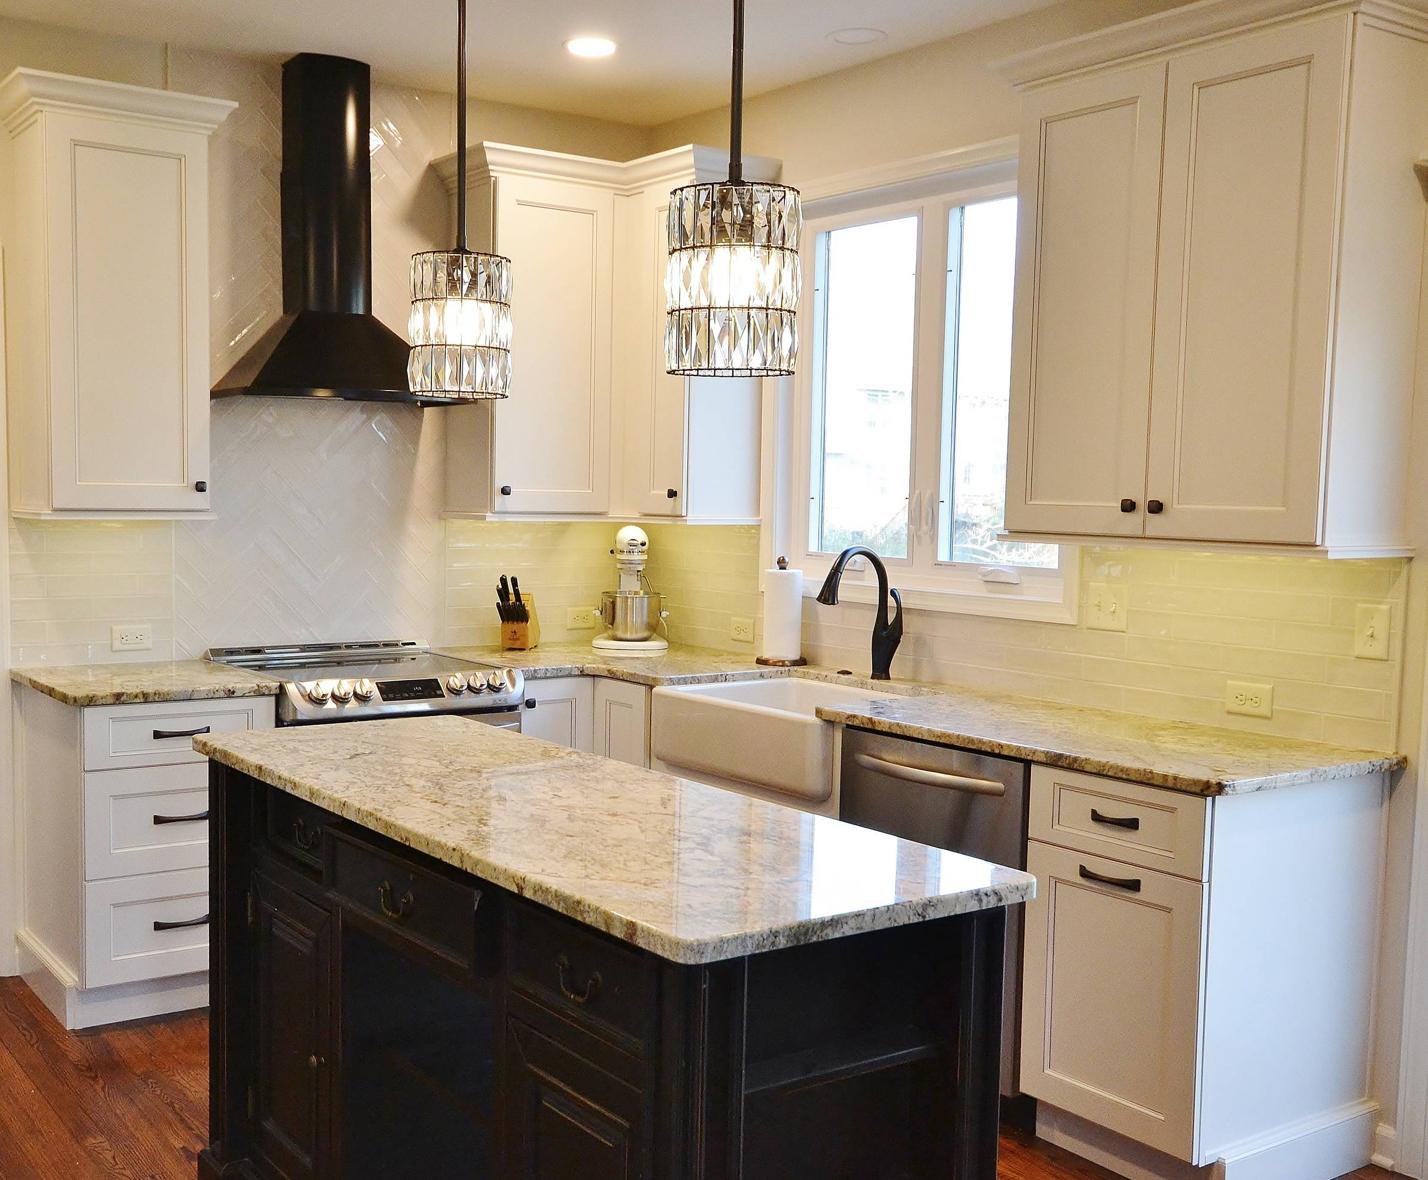 Full Kitchen Remodel Under $45K